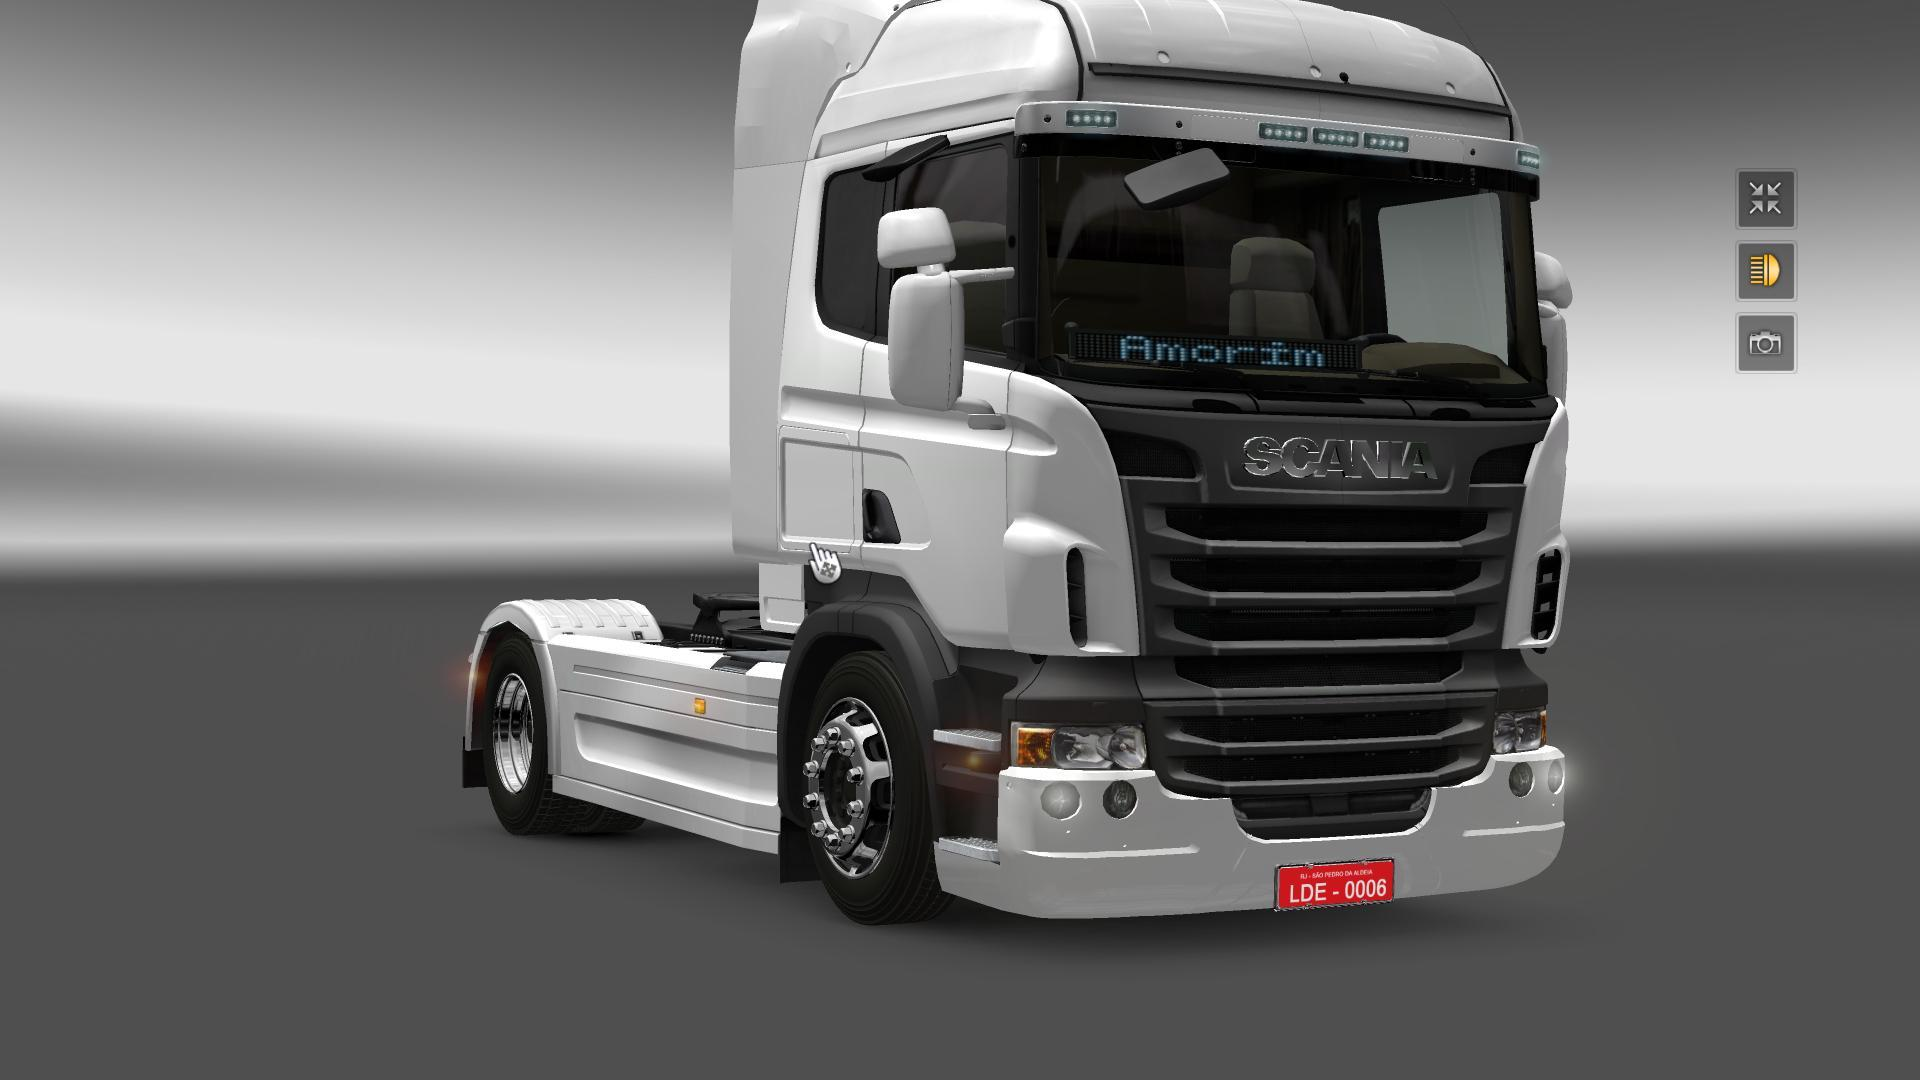 New Wheels For Scania Tuning Mod Euro Truck Simulator 2